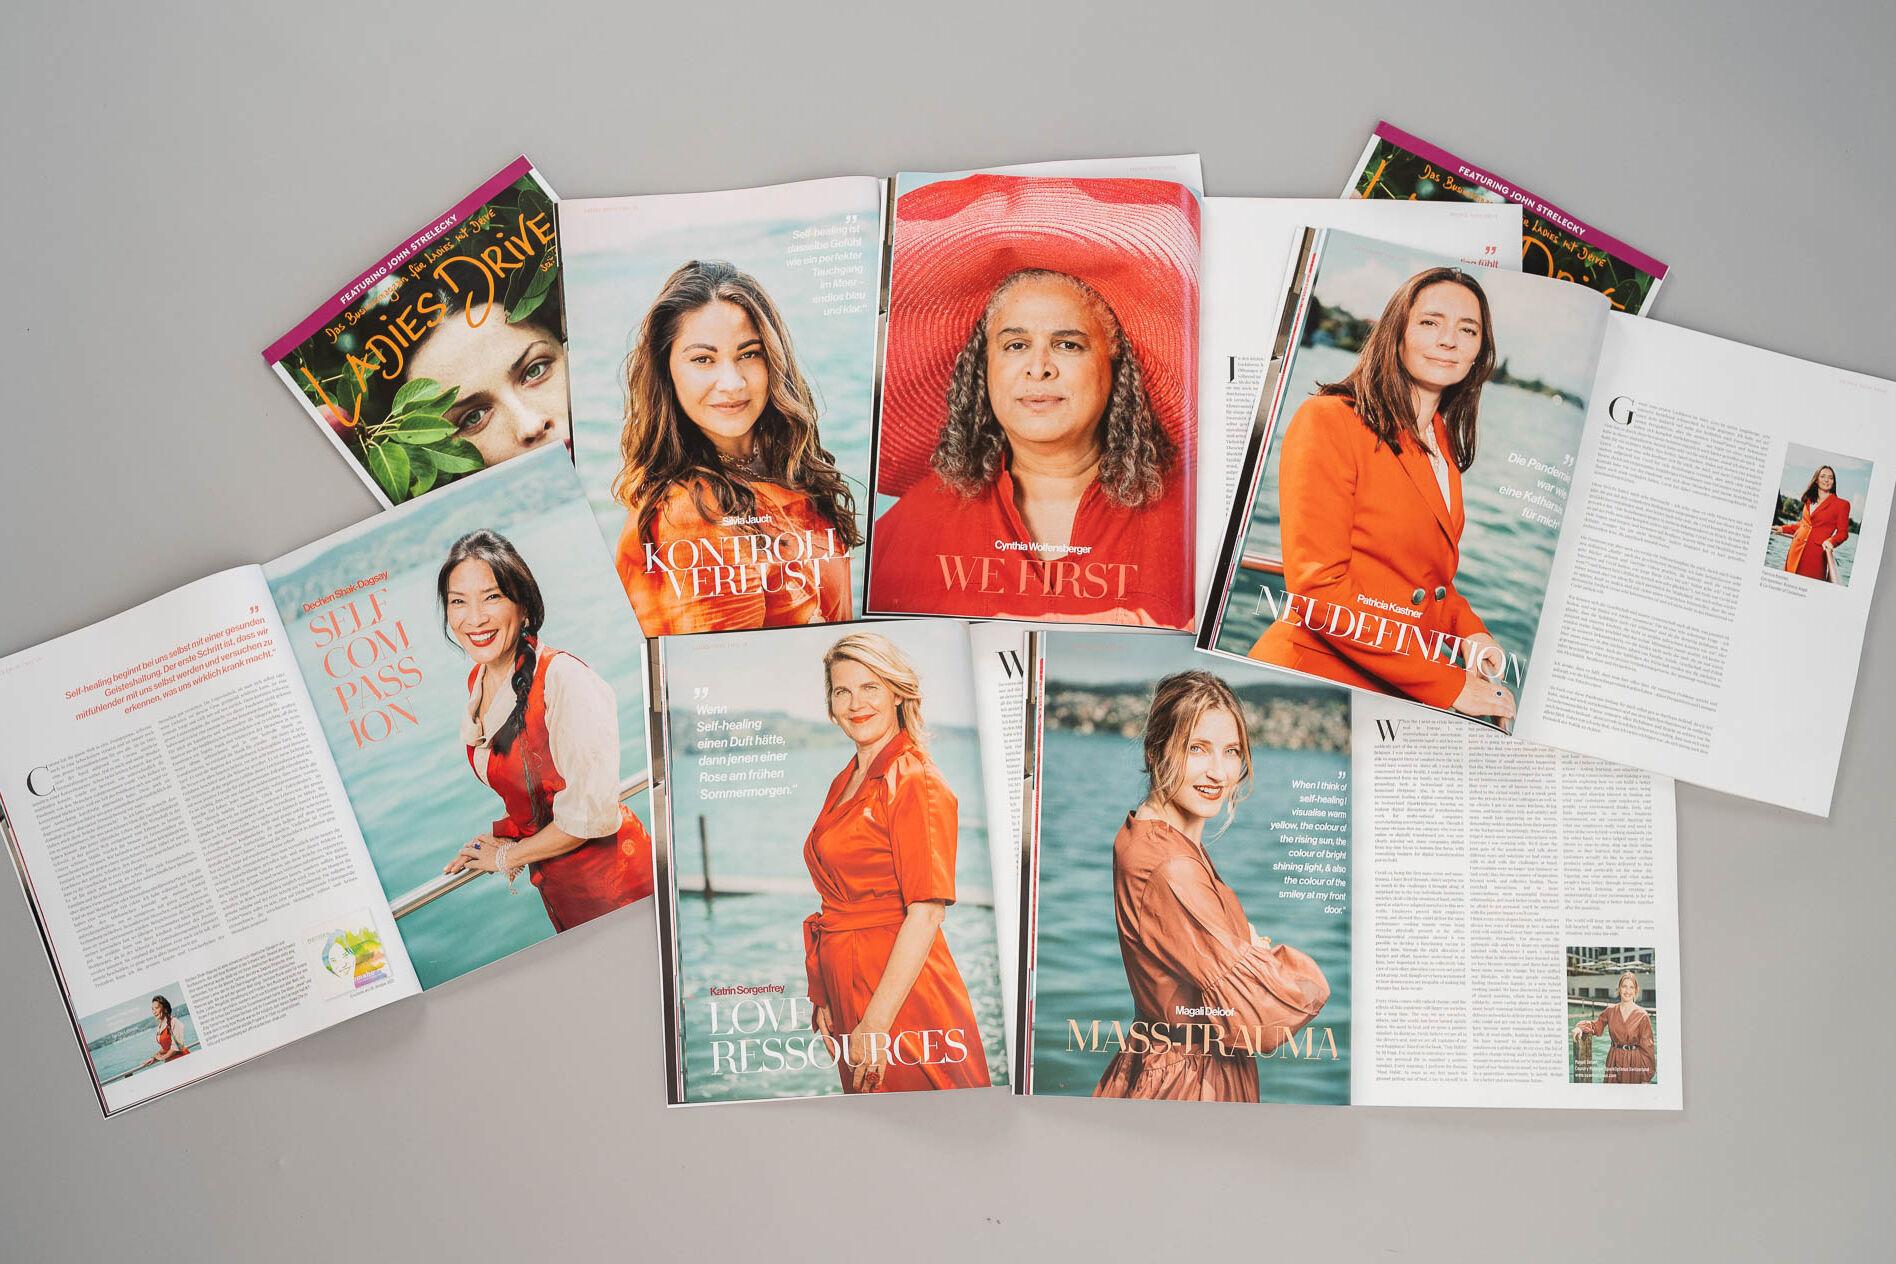 Portraits of Self-Healing for Ladies Drive Magazine by Tomek Gola / Gola.PRO